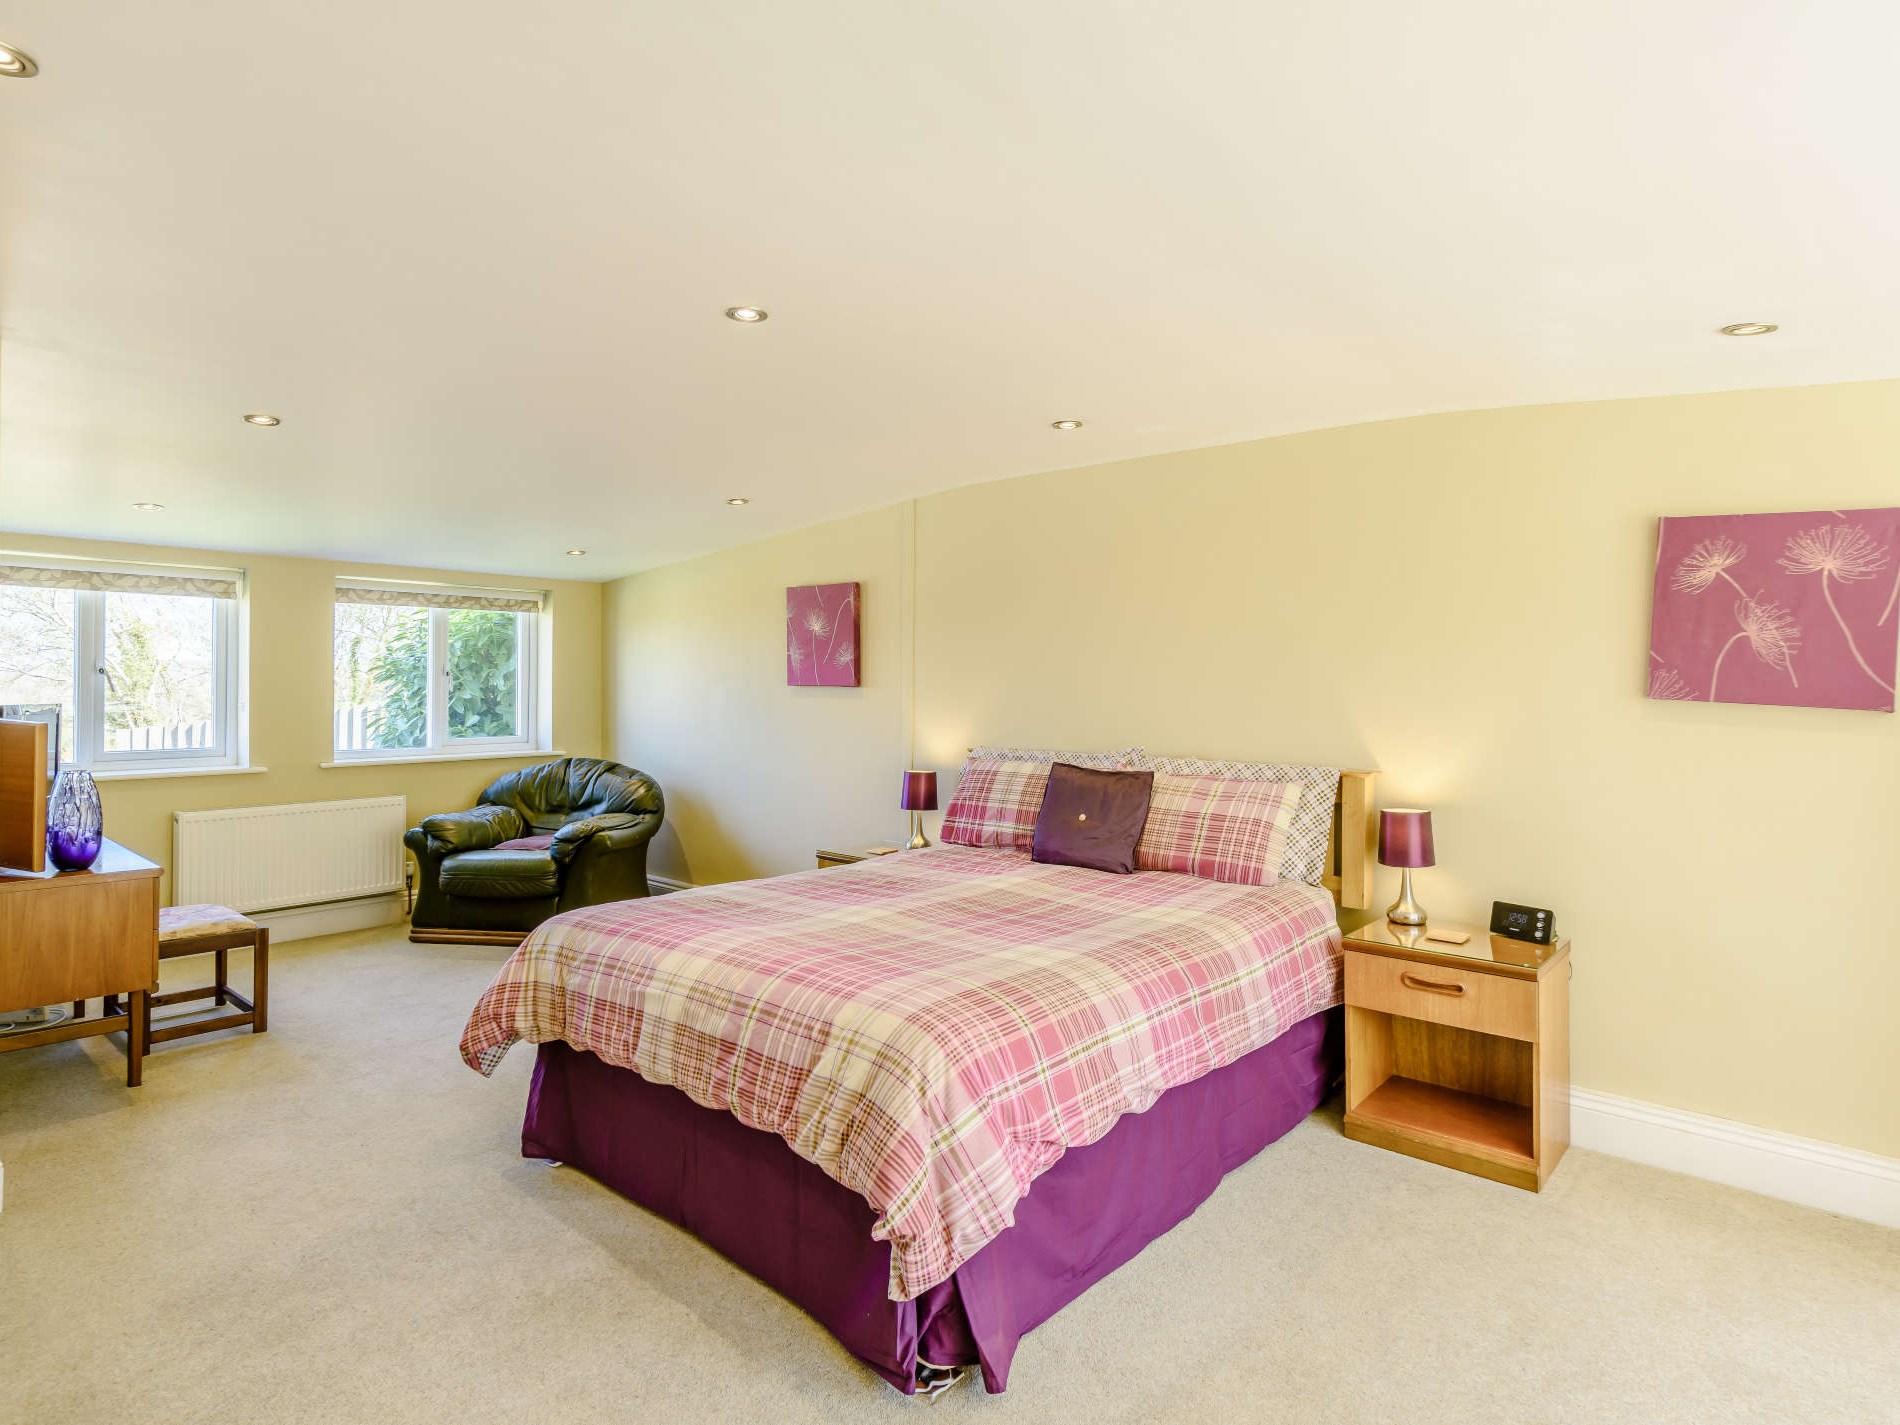 2 Bedroom Cottage in Okehampton, Devon